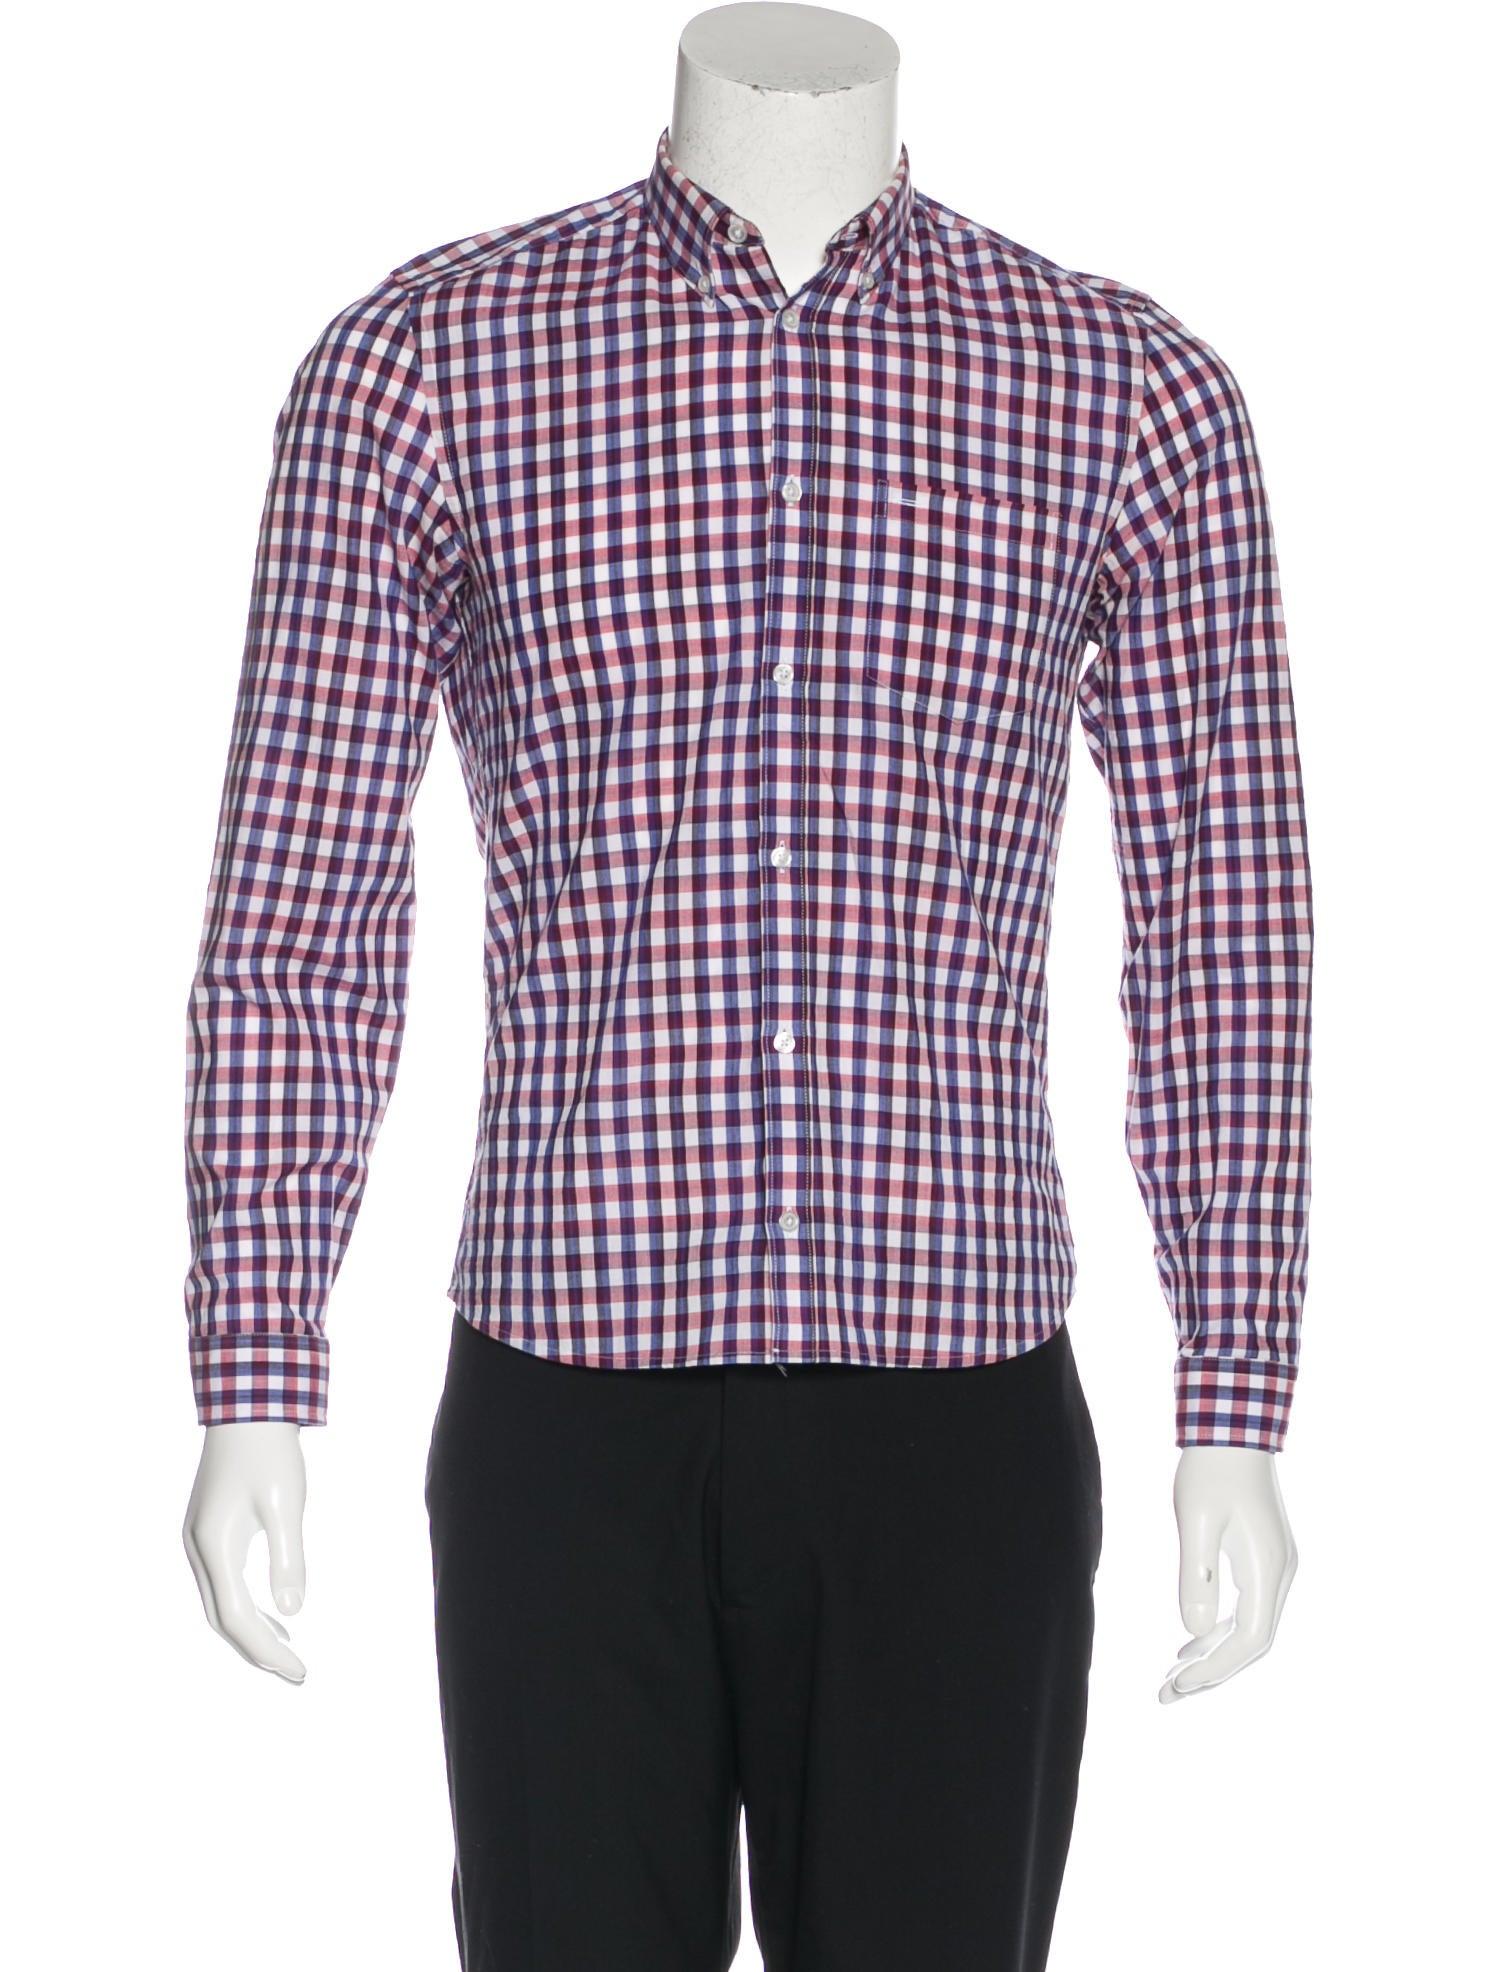 Kenzo gingham dress shirt clothing ken25587 the realreal for Gingham dress shirt men